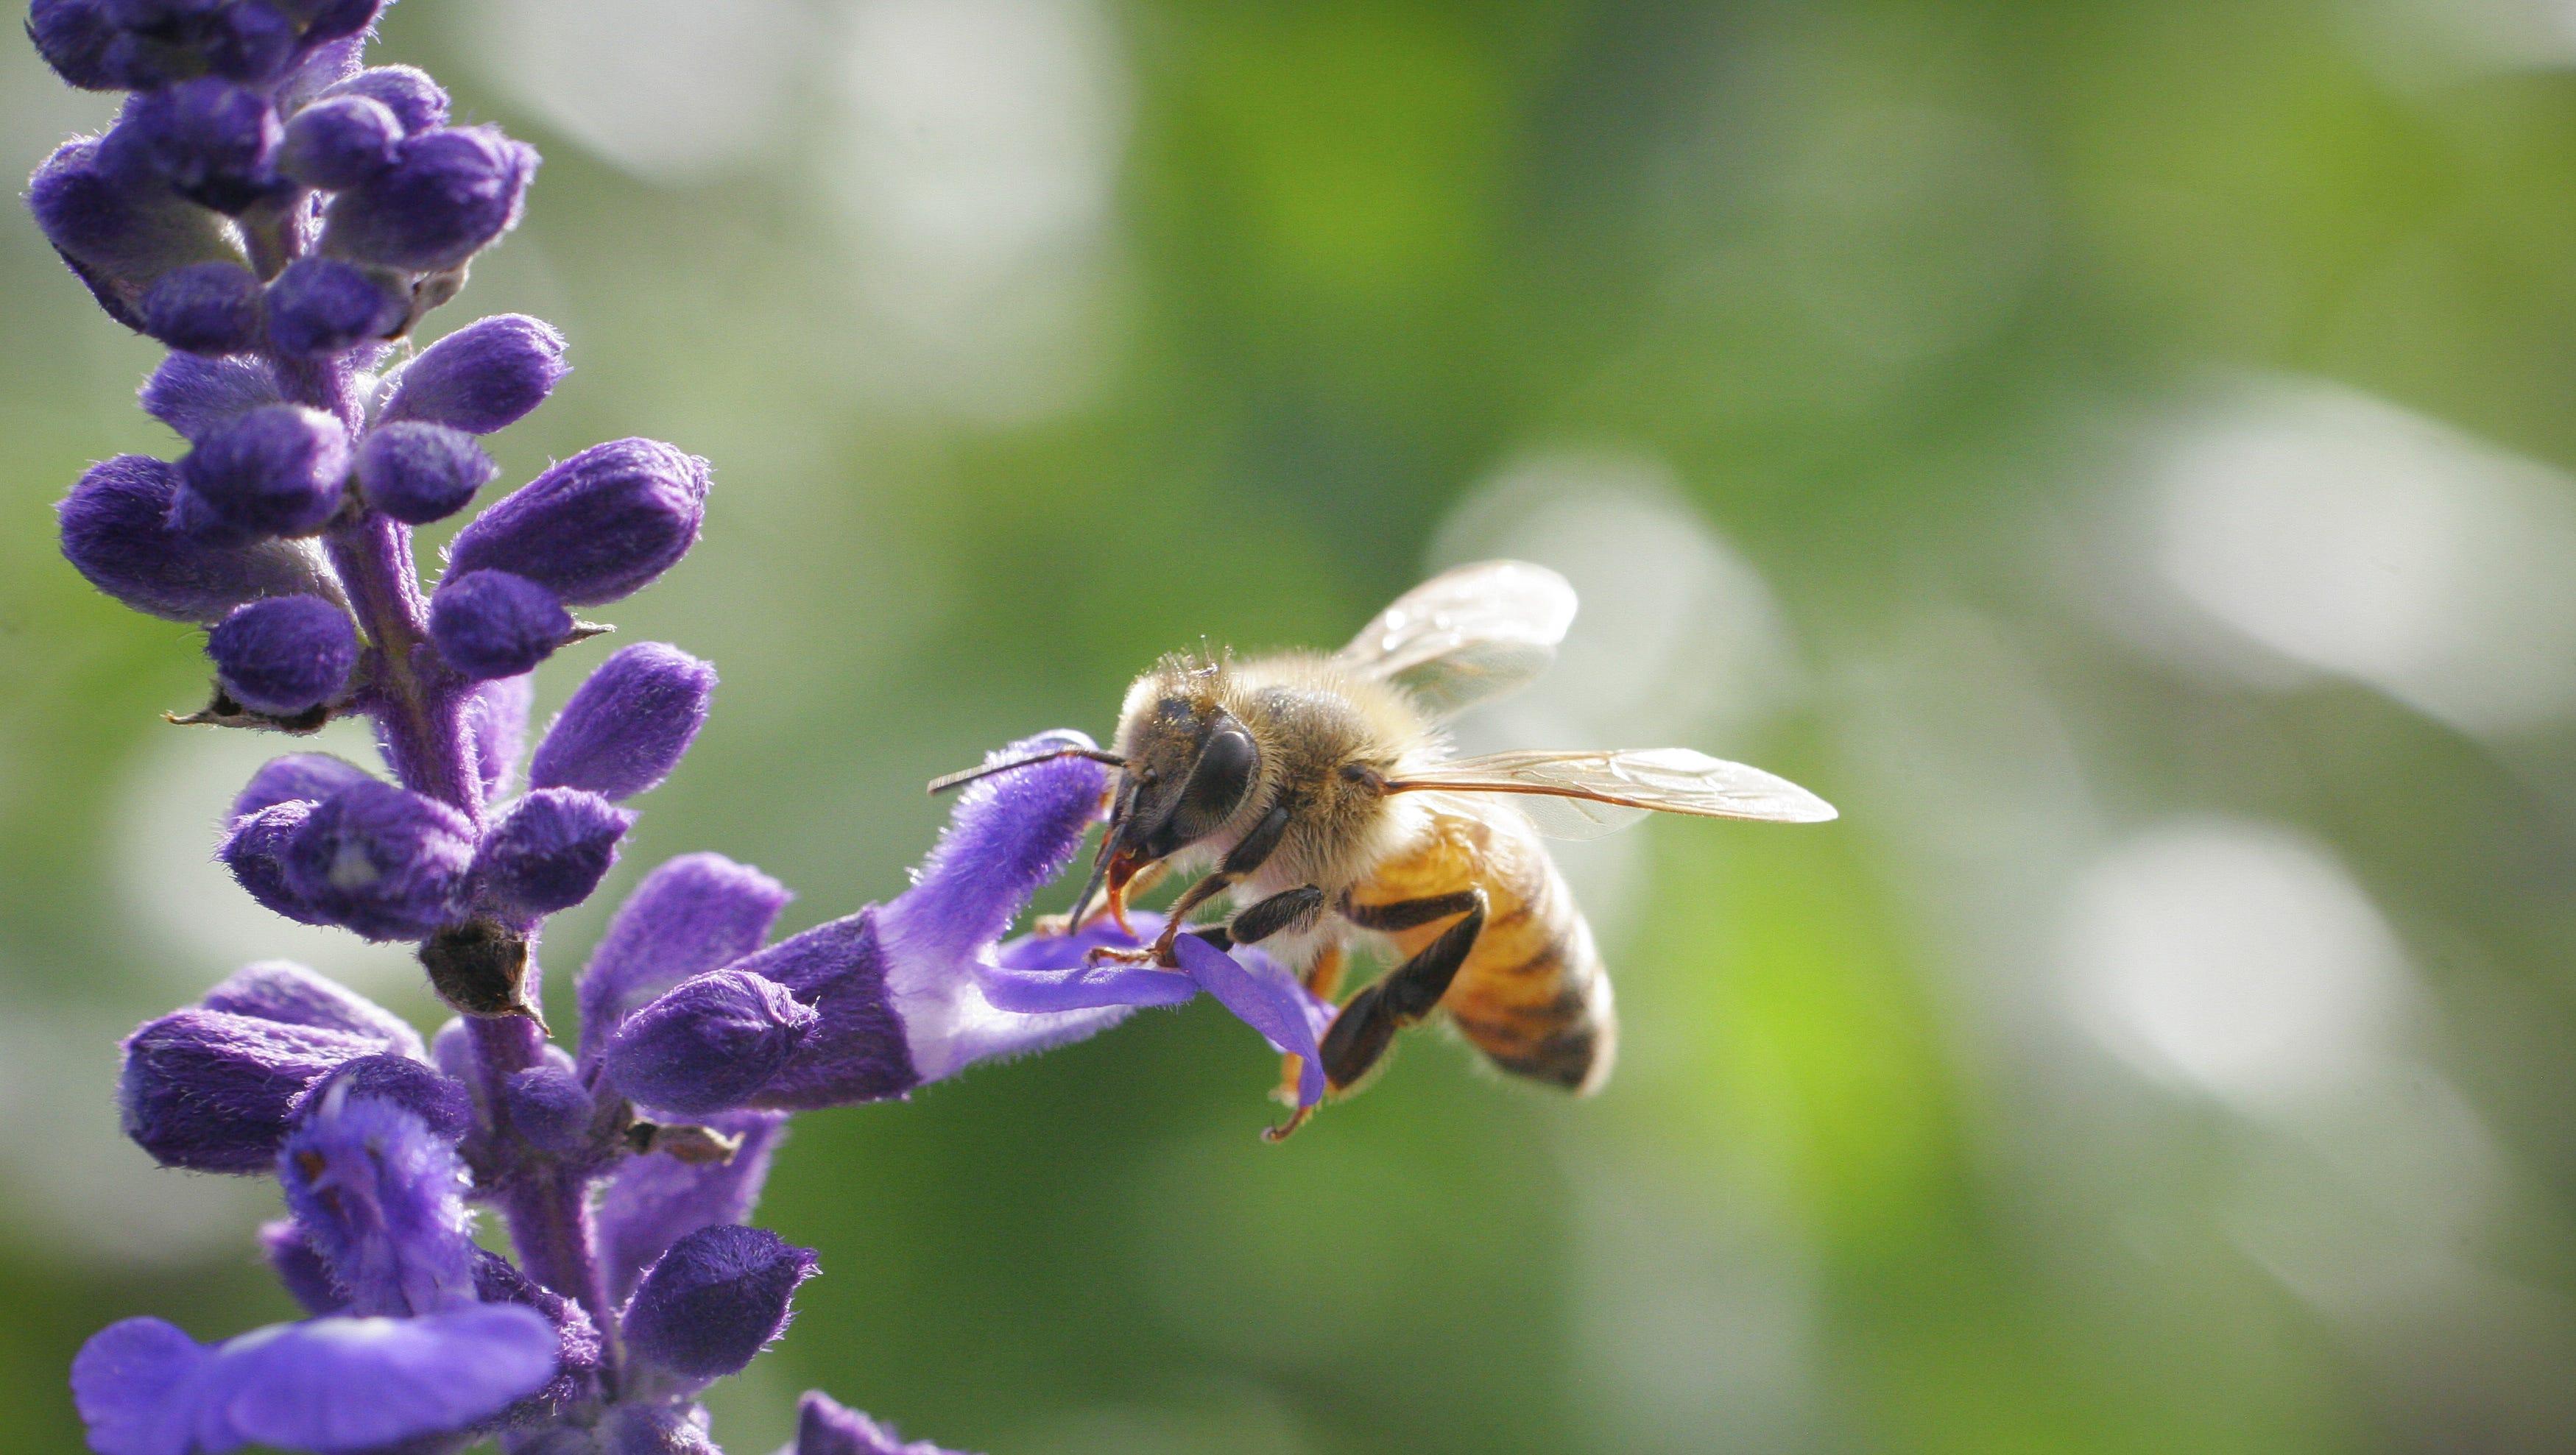 Dvoboj slika  - Page 25 635938339093727386-honeybee